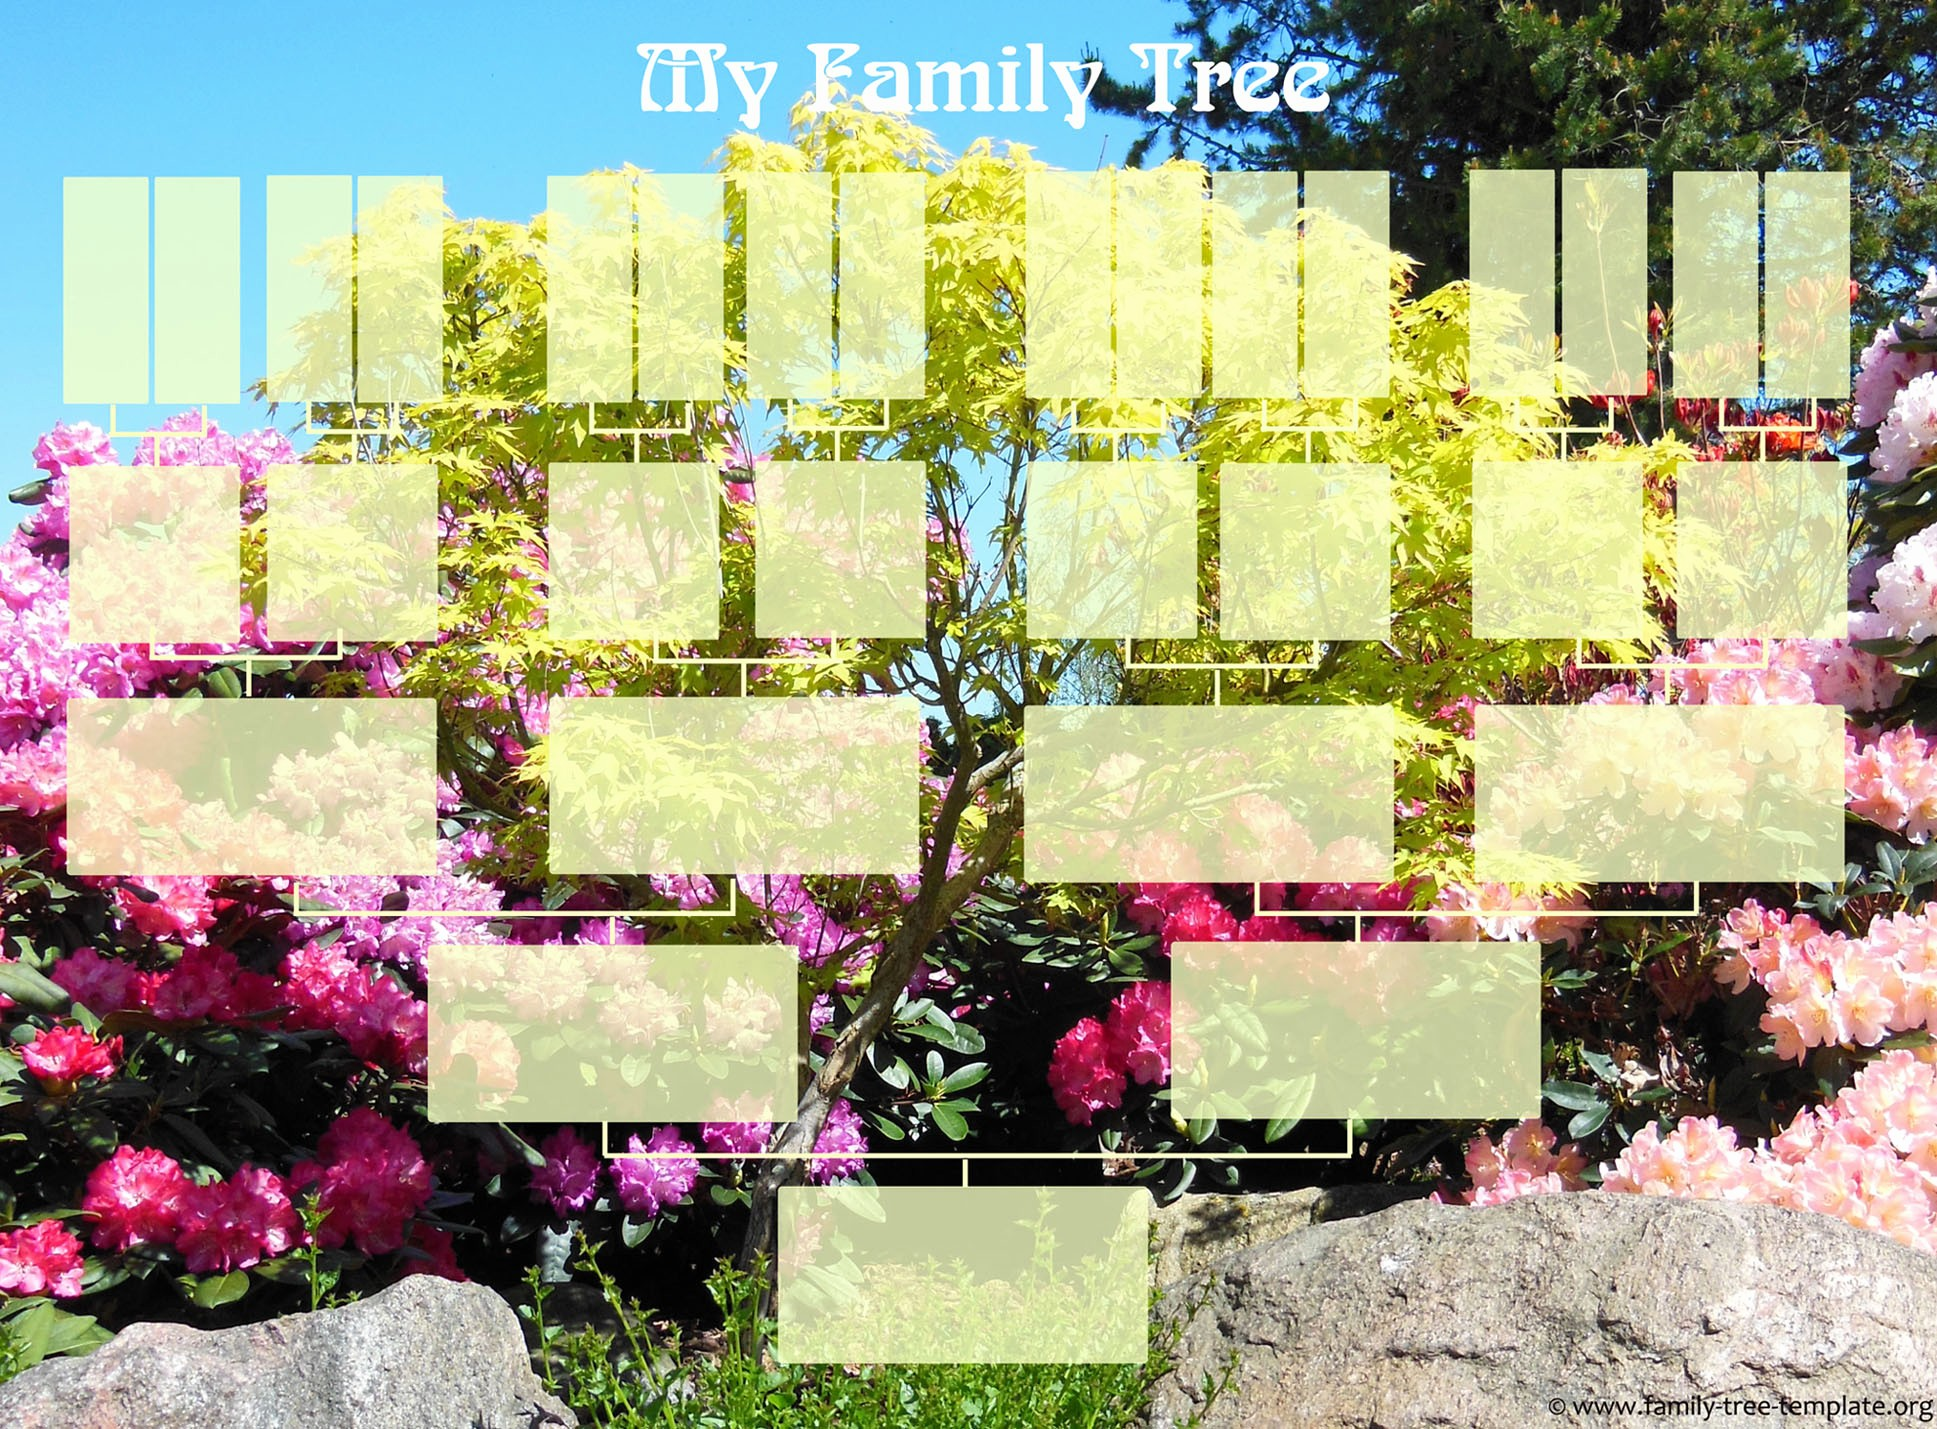 5 Generation Family Tree Template Elegant Free Family Tree Templates Using Free Ancestry